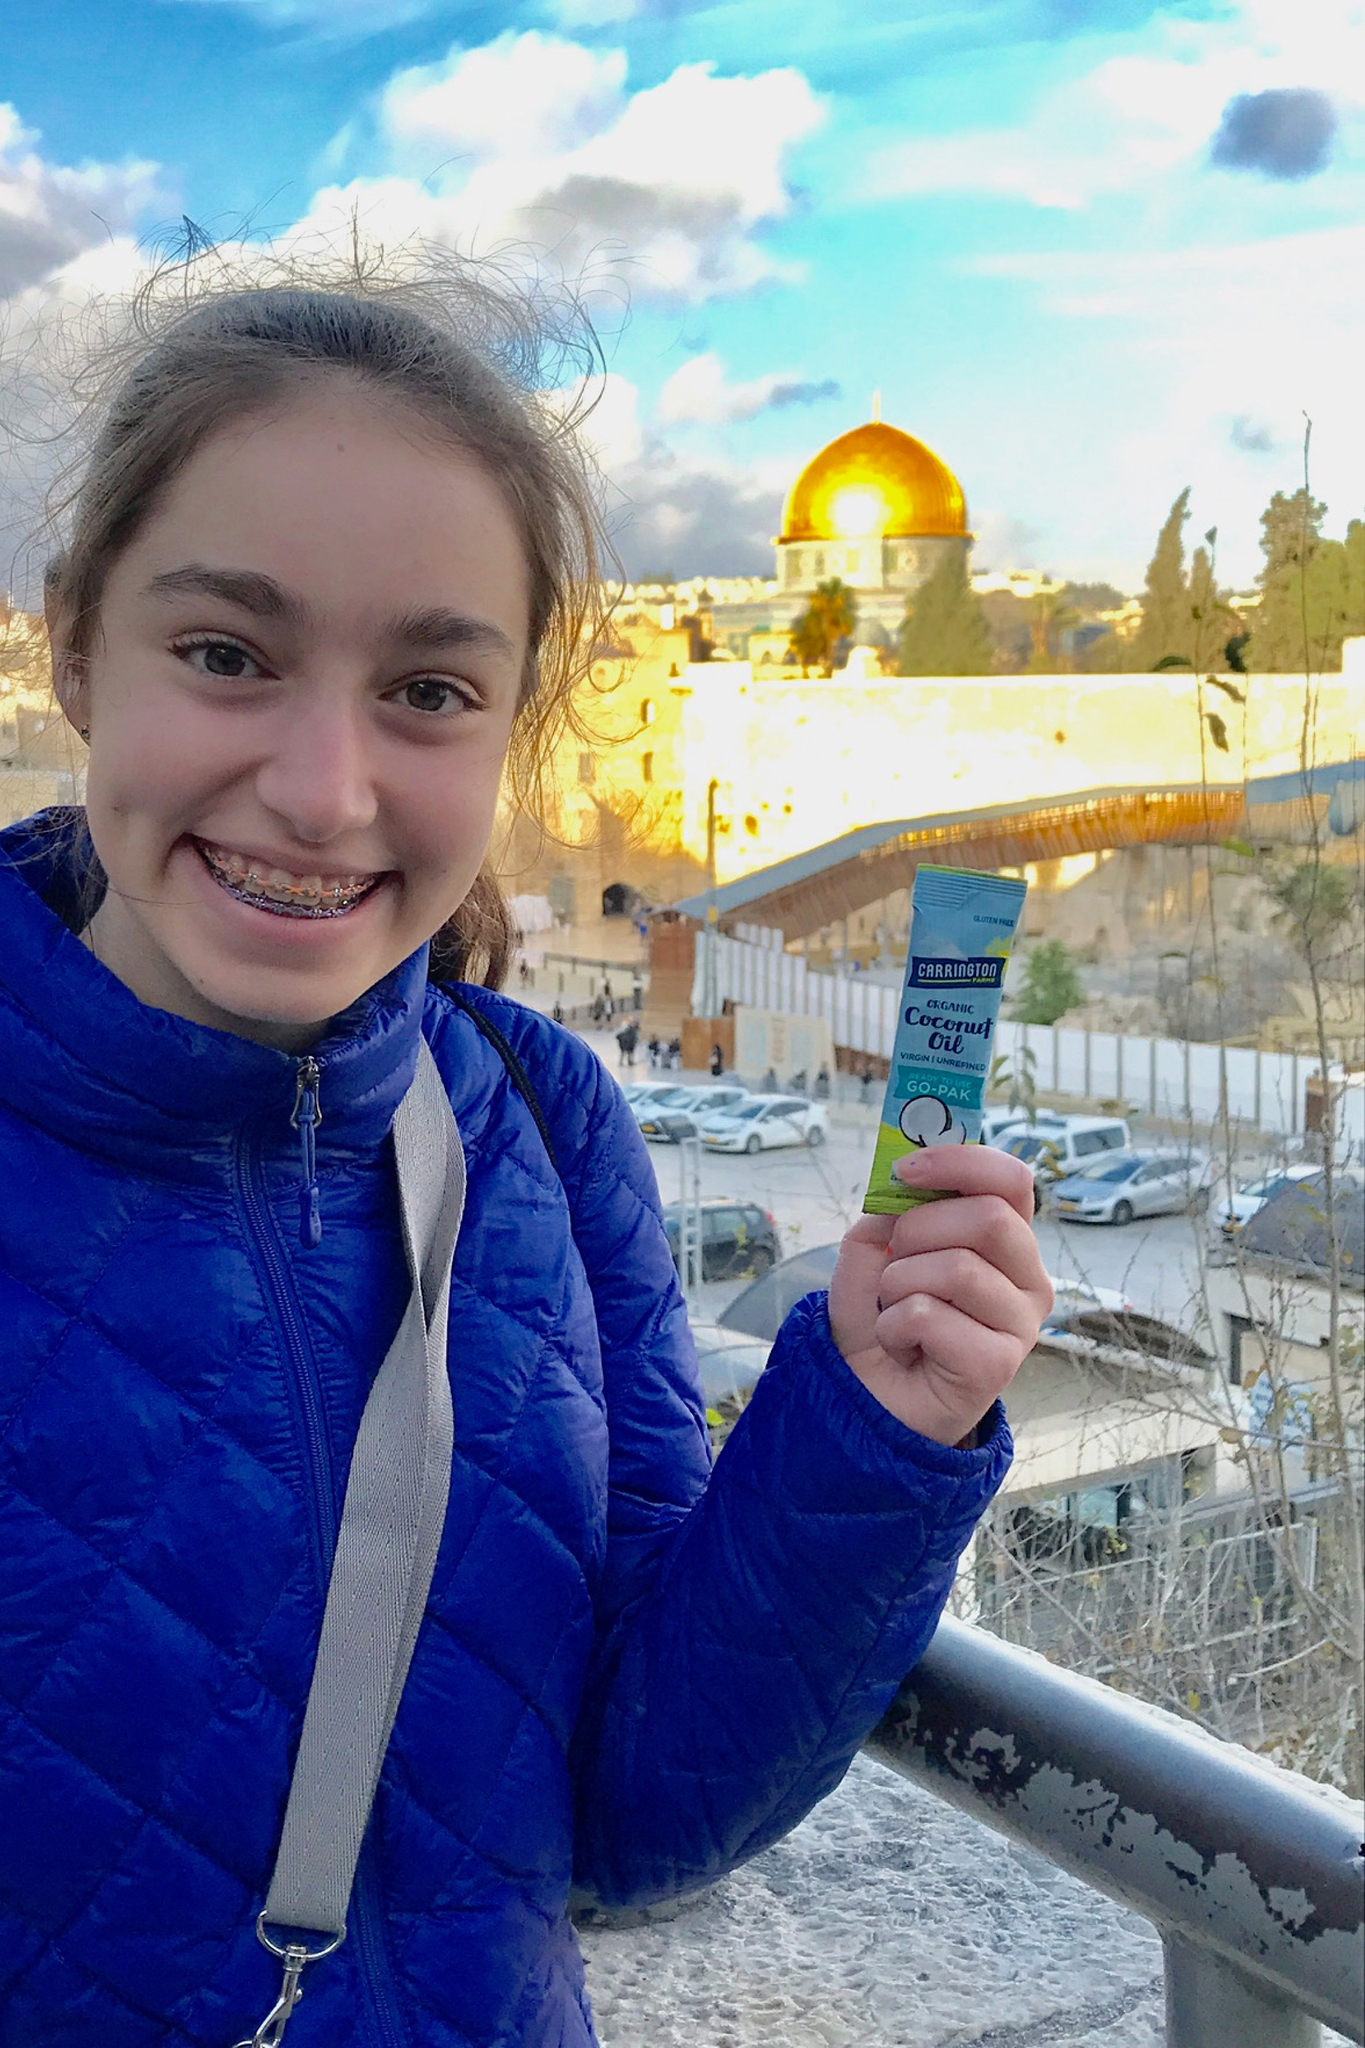 Coconut Oil Paks in Israel